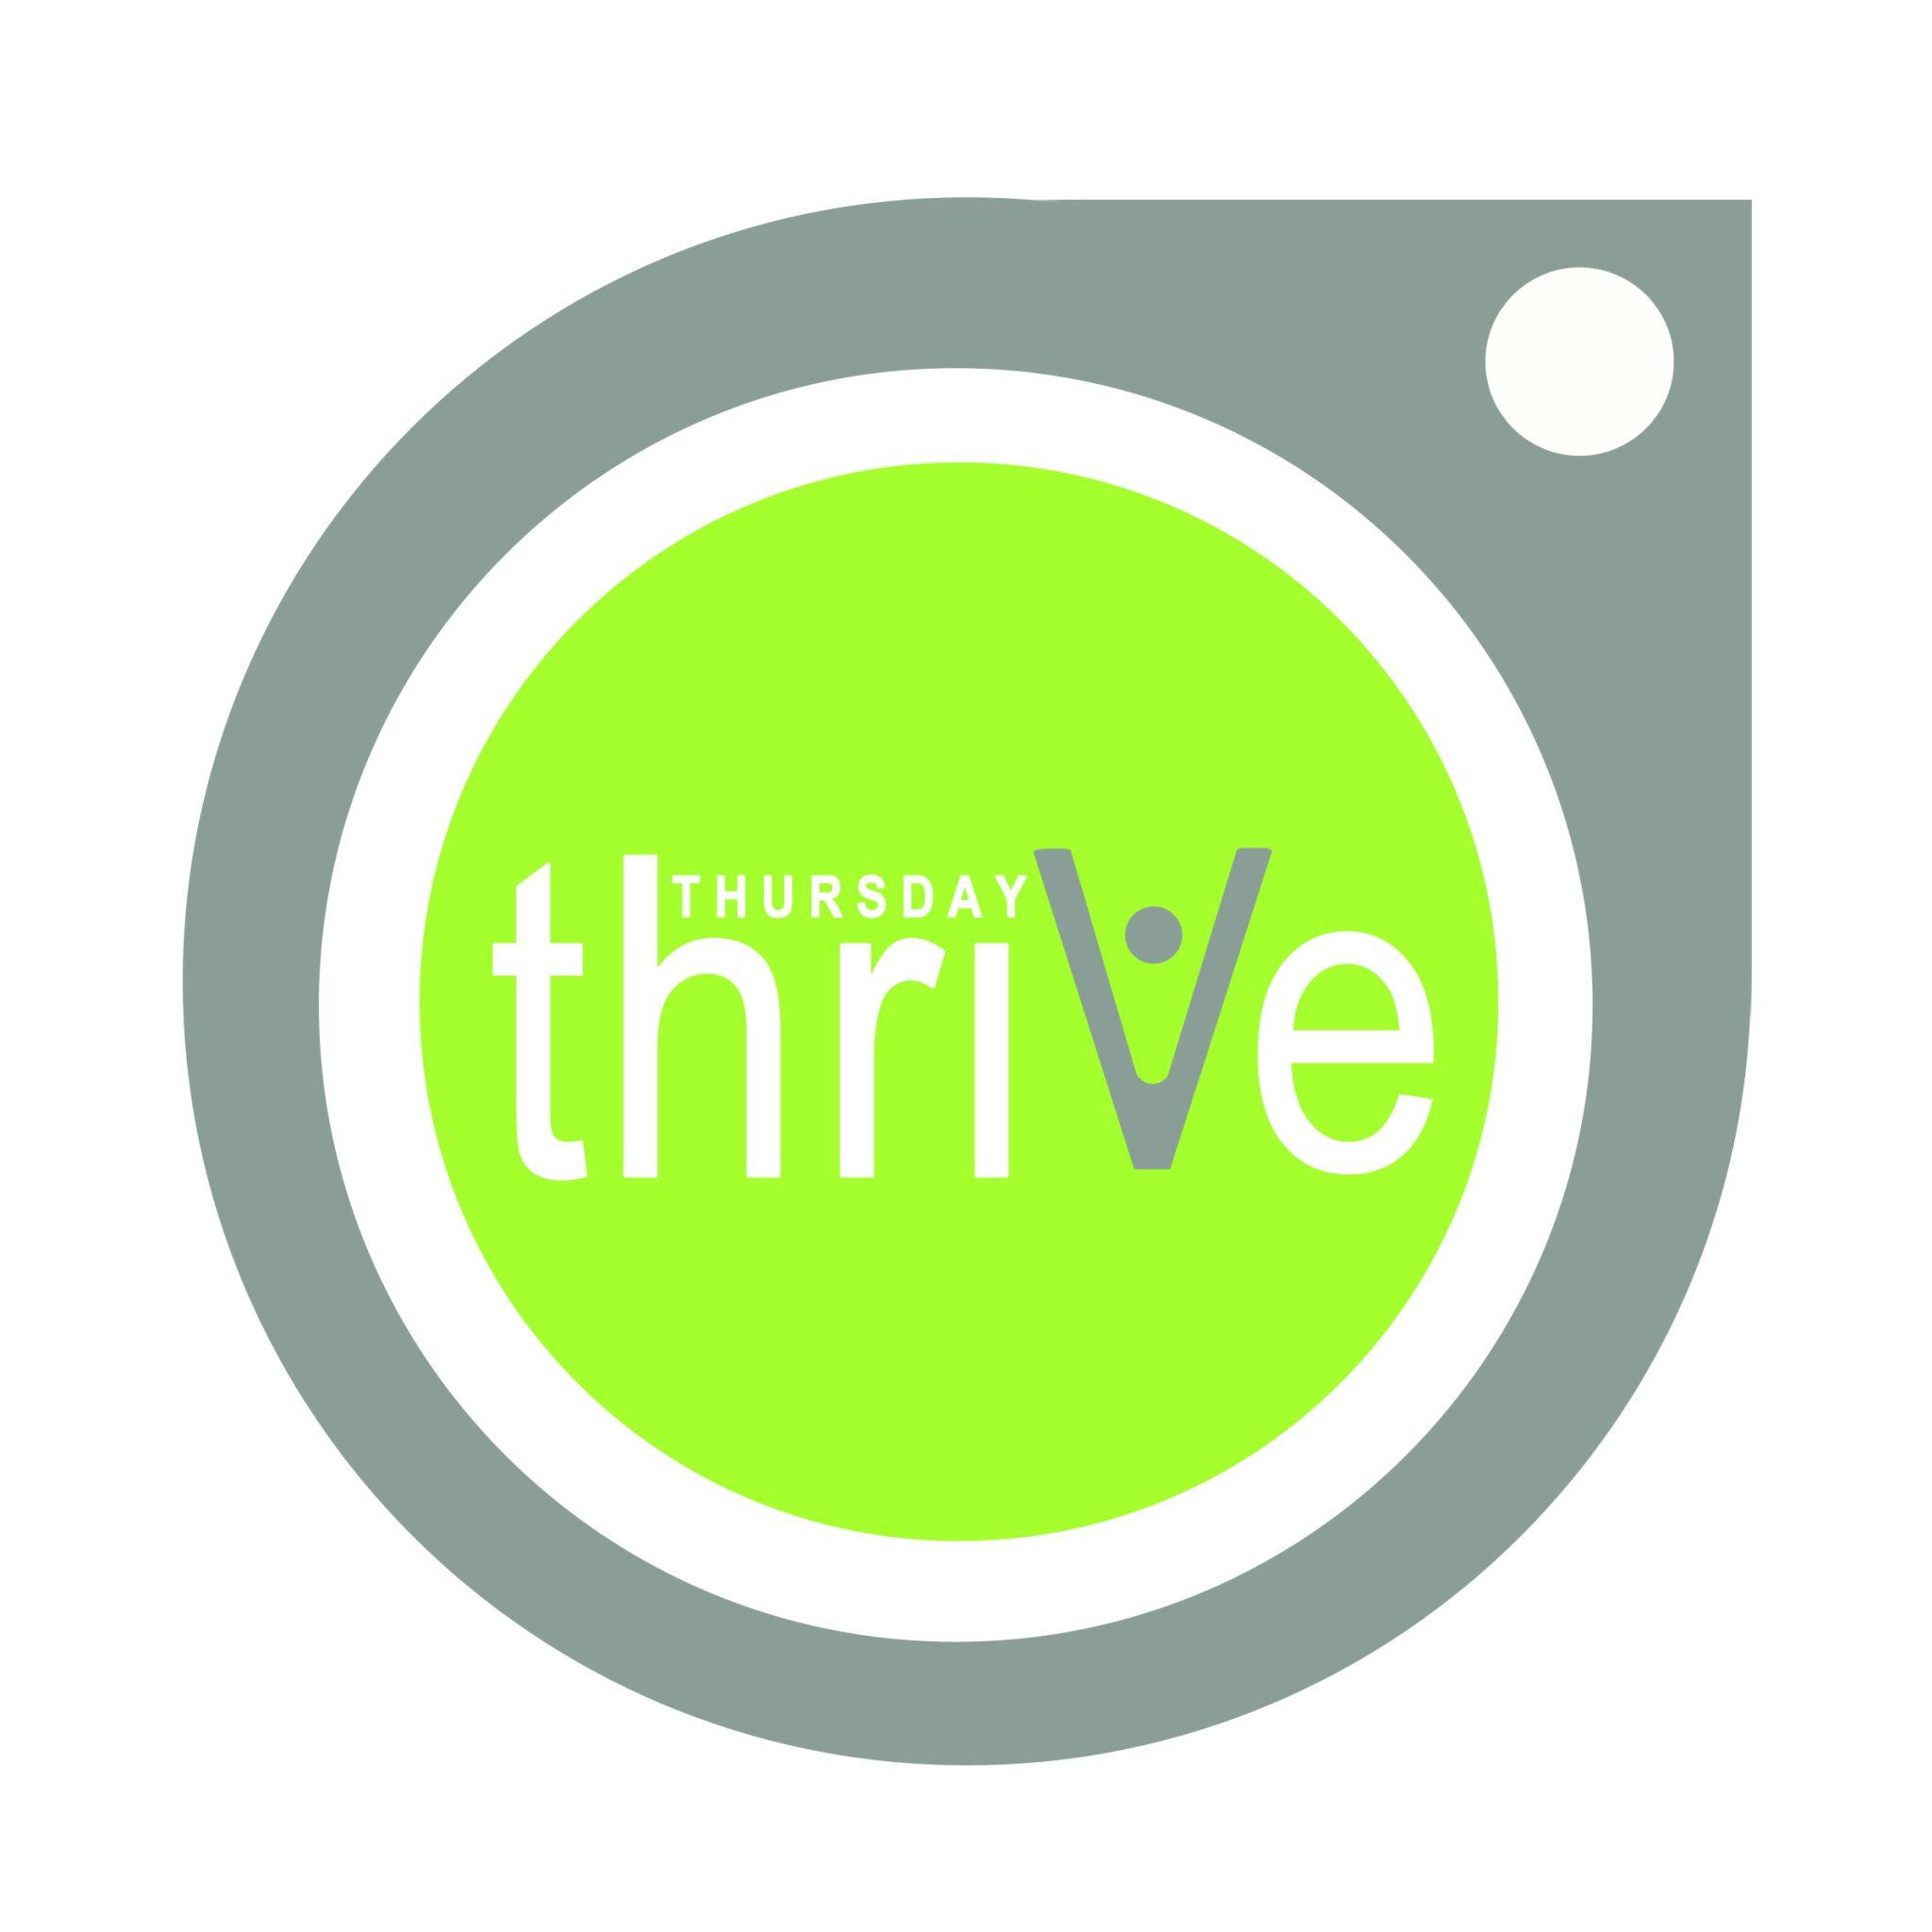 Thursday Thrive from Friendship Baptist Church